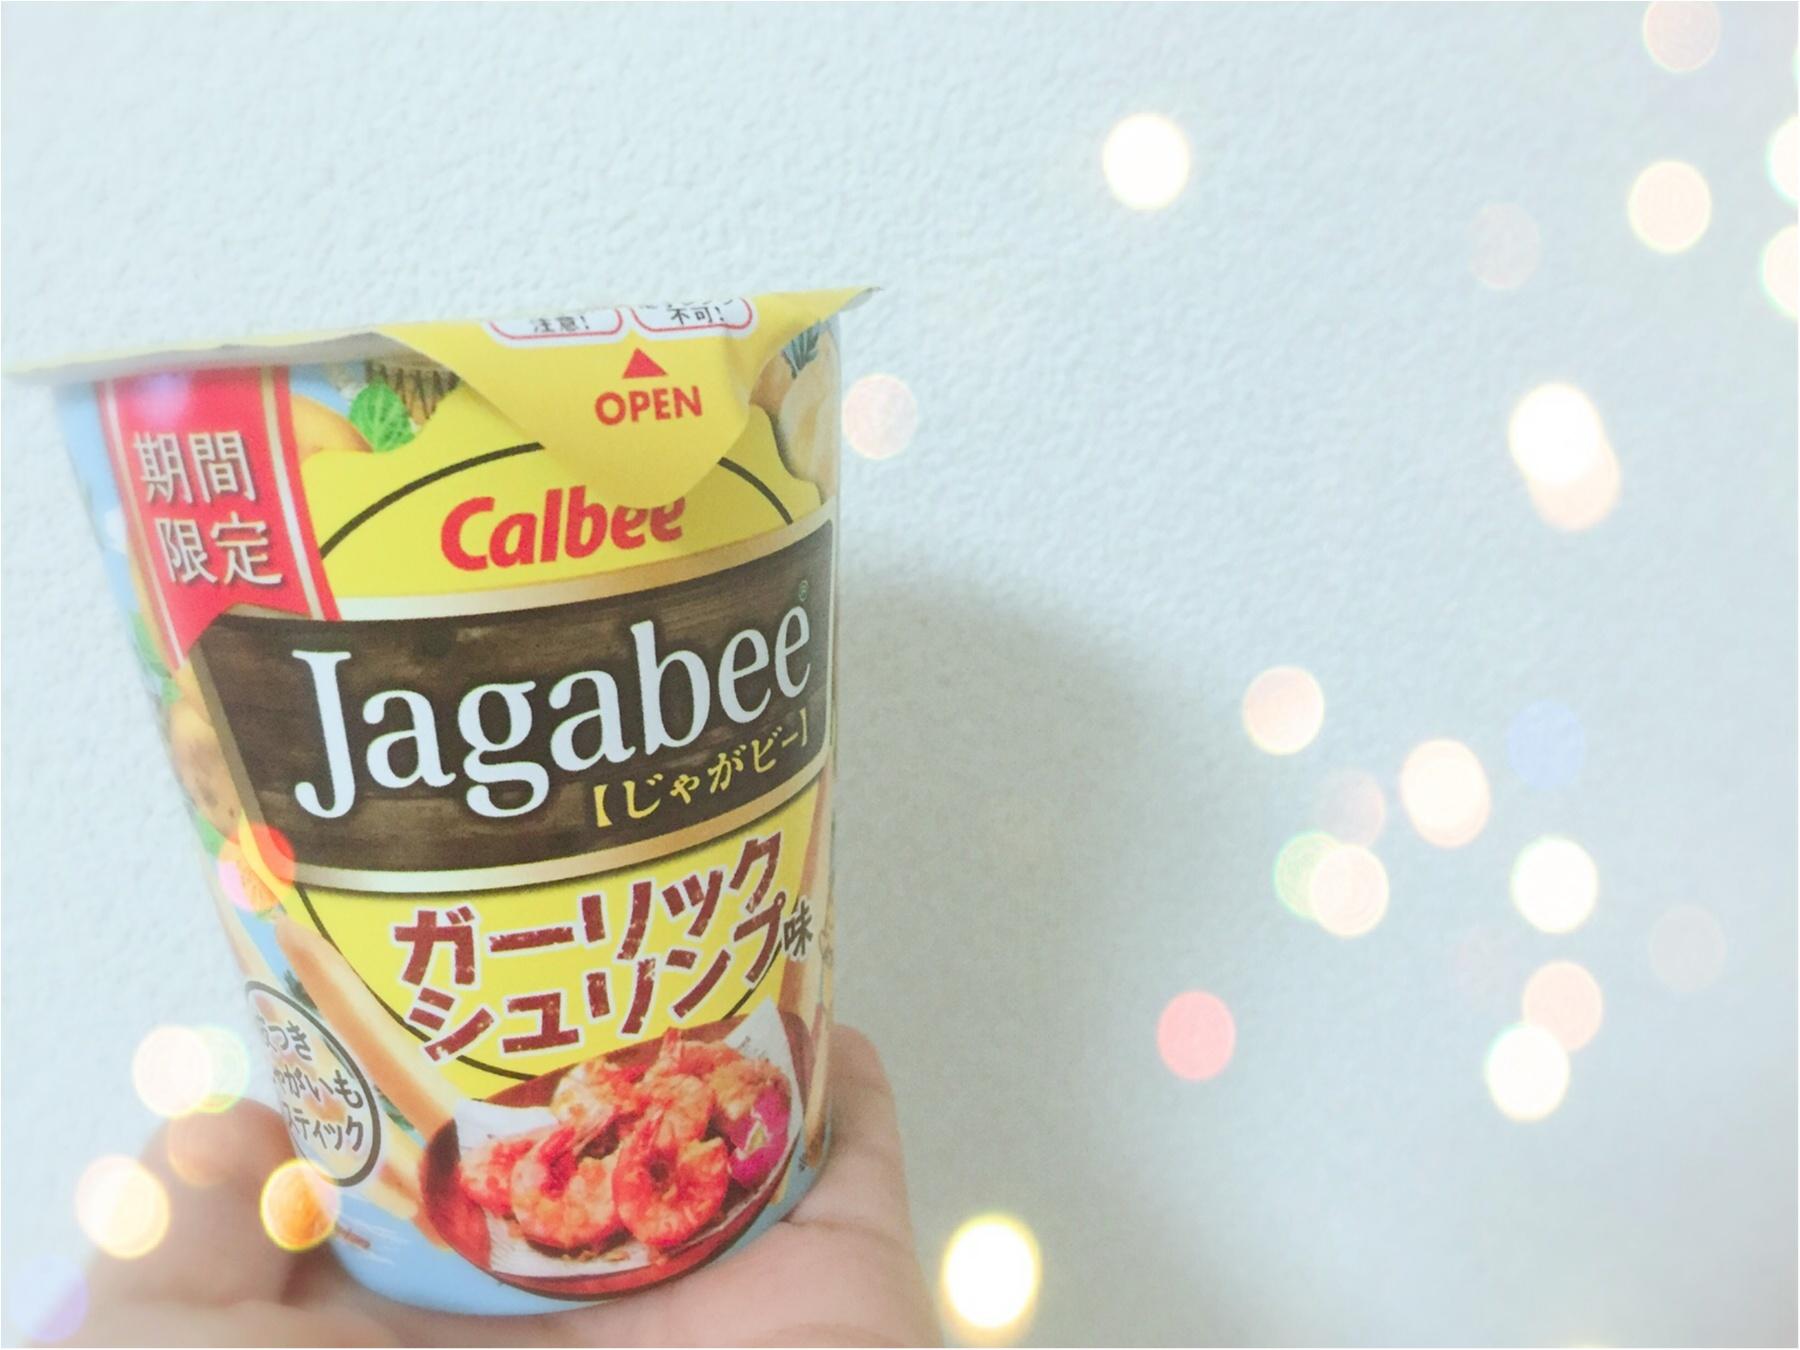 …ஐ 【期間限定Jagabee】ガーリックシュリンプ味がハマる♡ ஐ¨_1